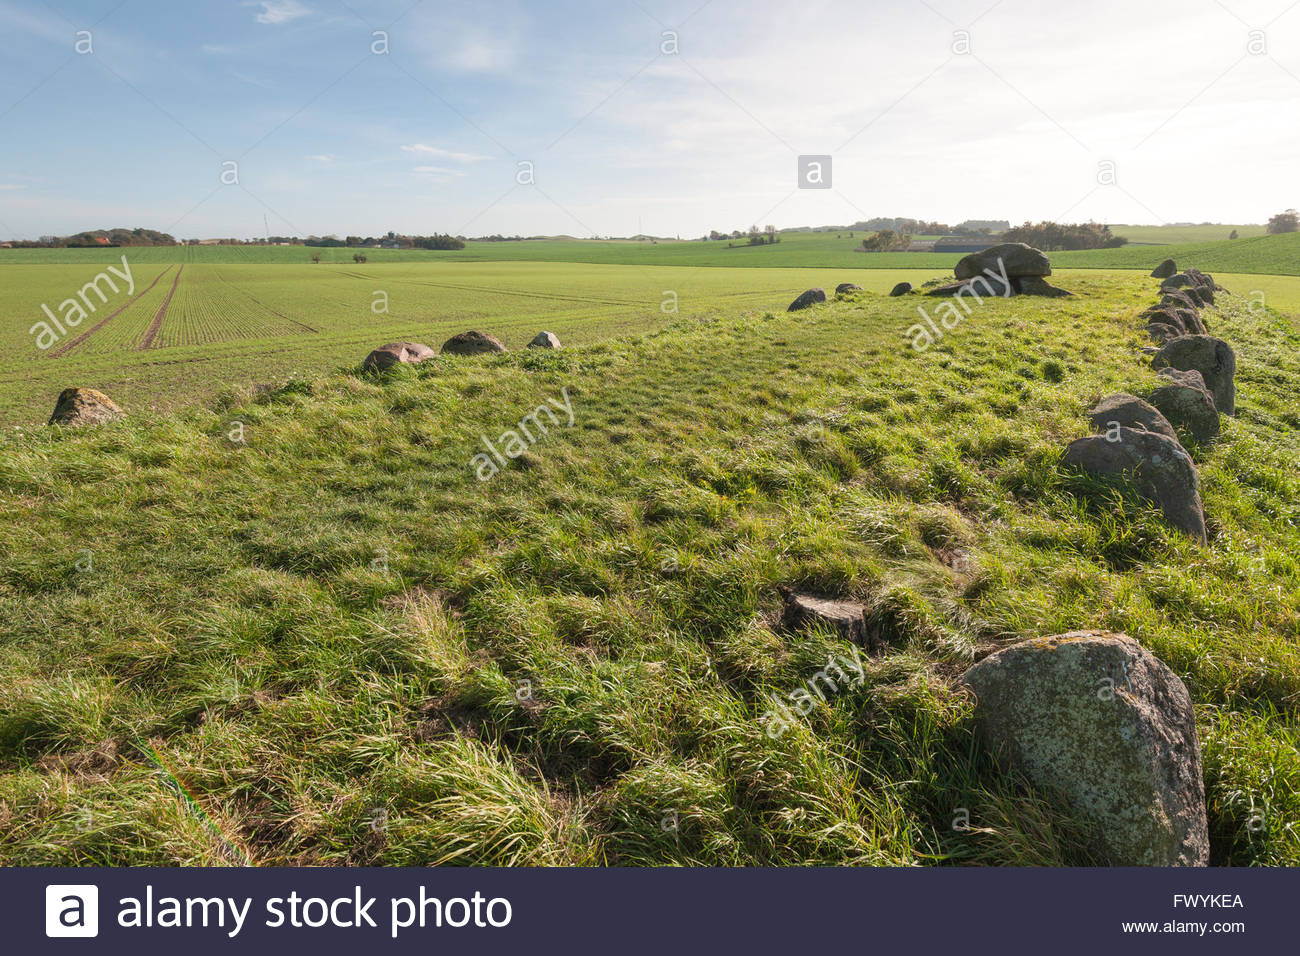 King Humbles grave, Humble, Langeland, Denmark / Humble - Stock Image